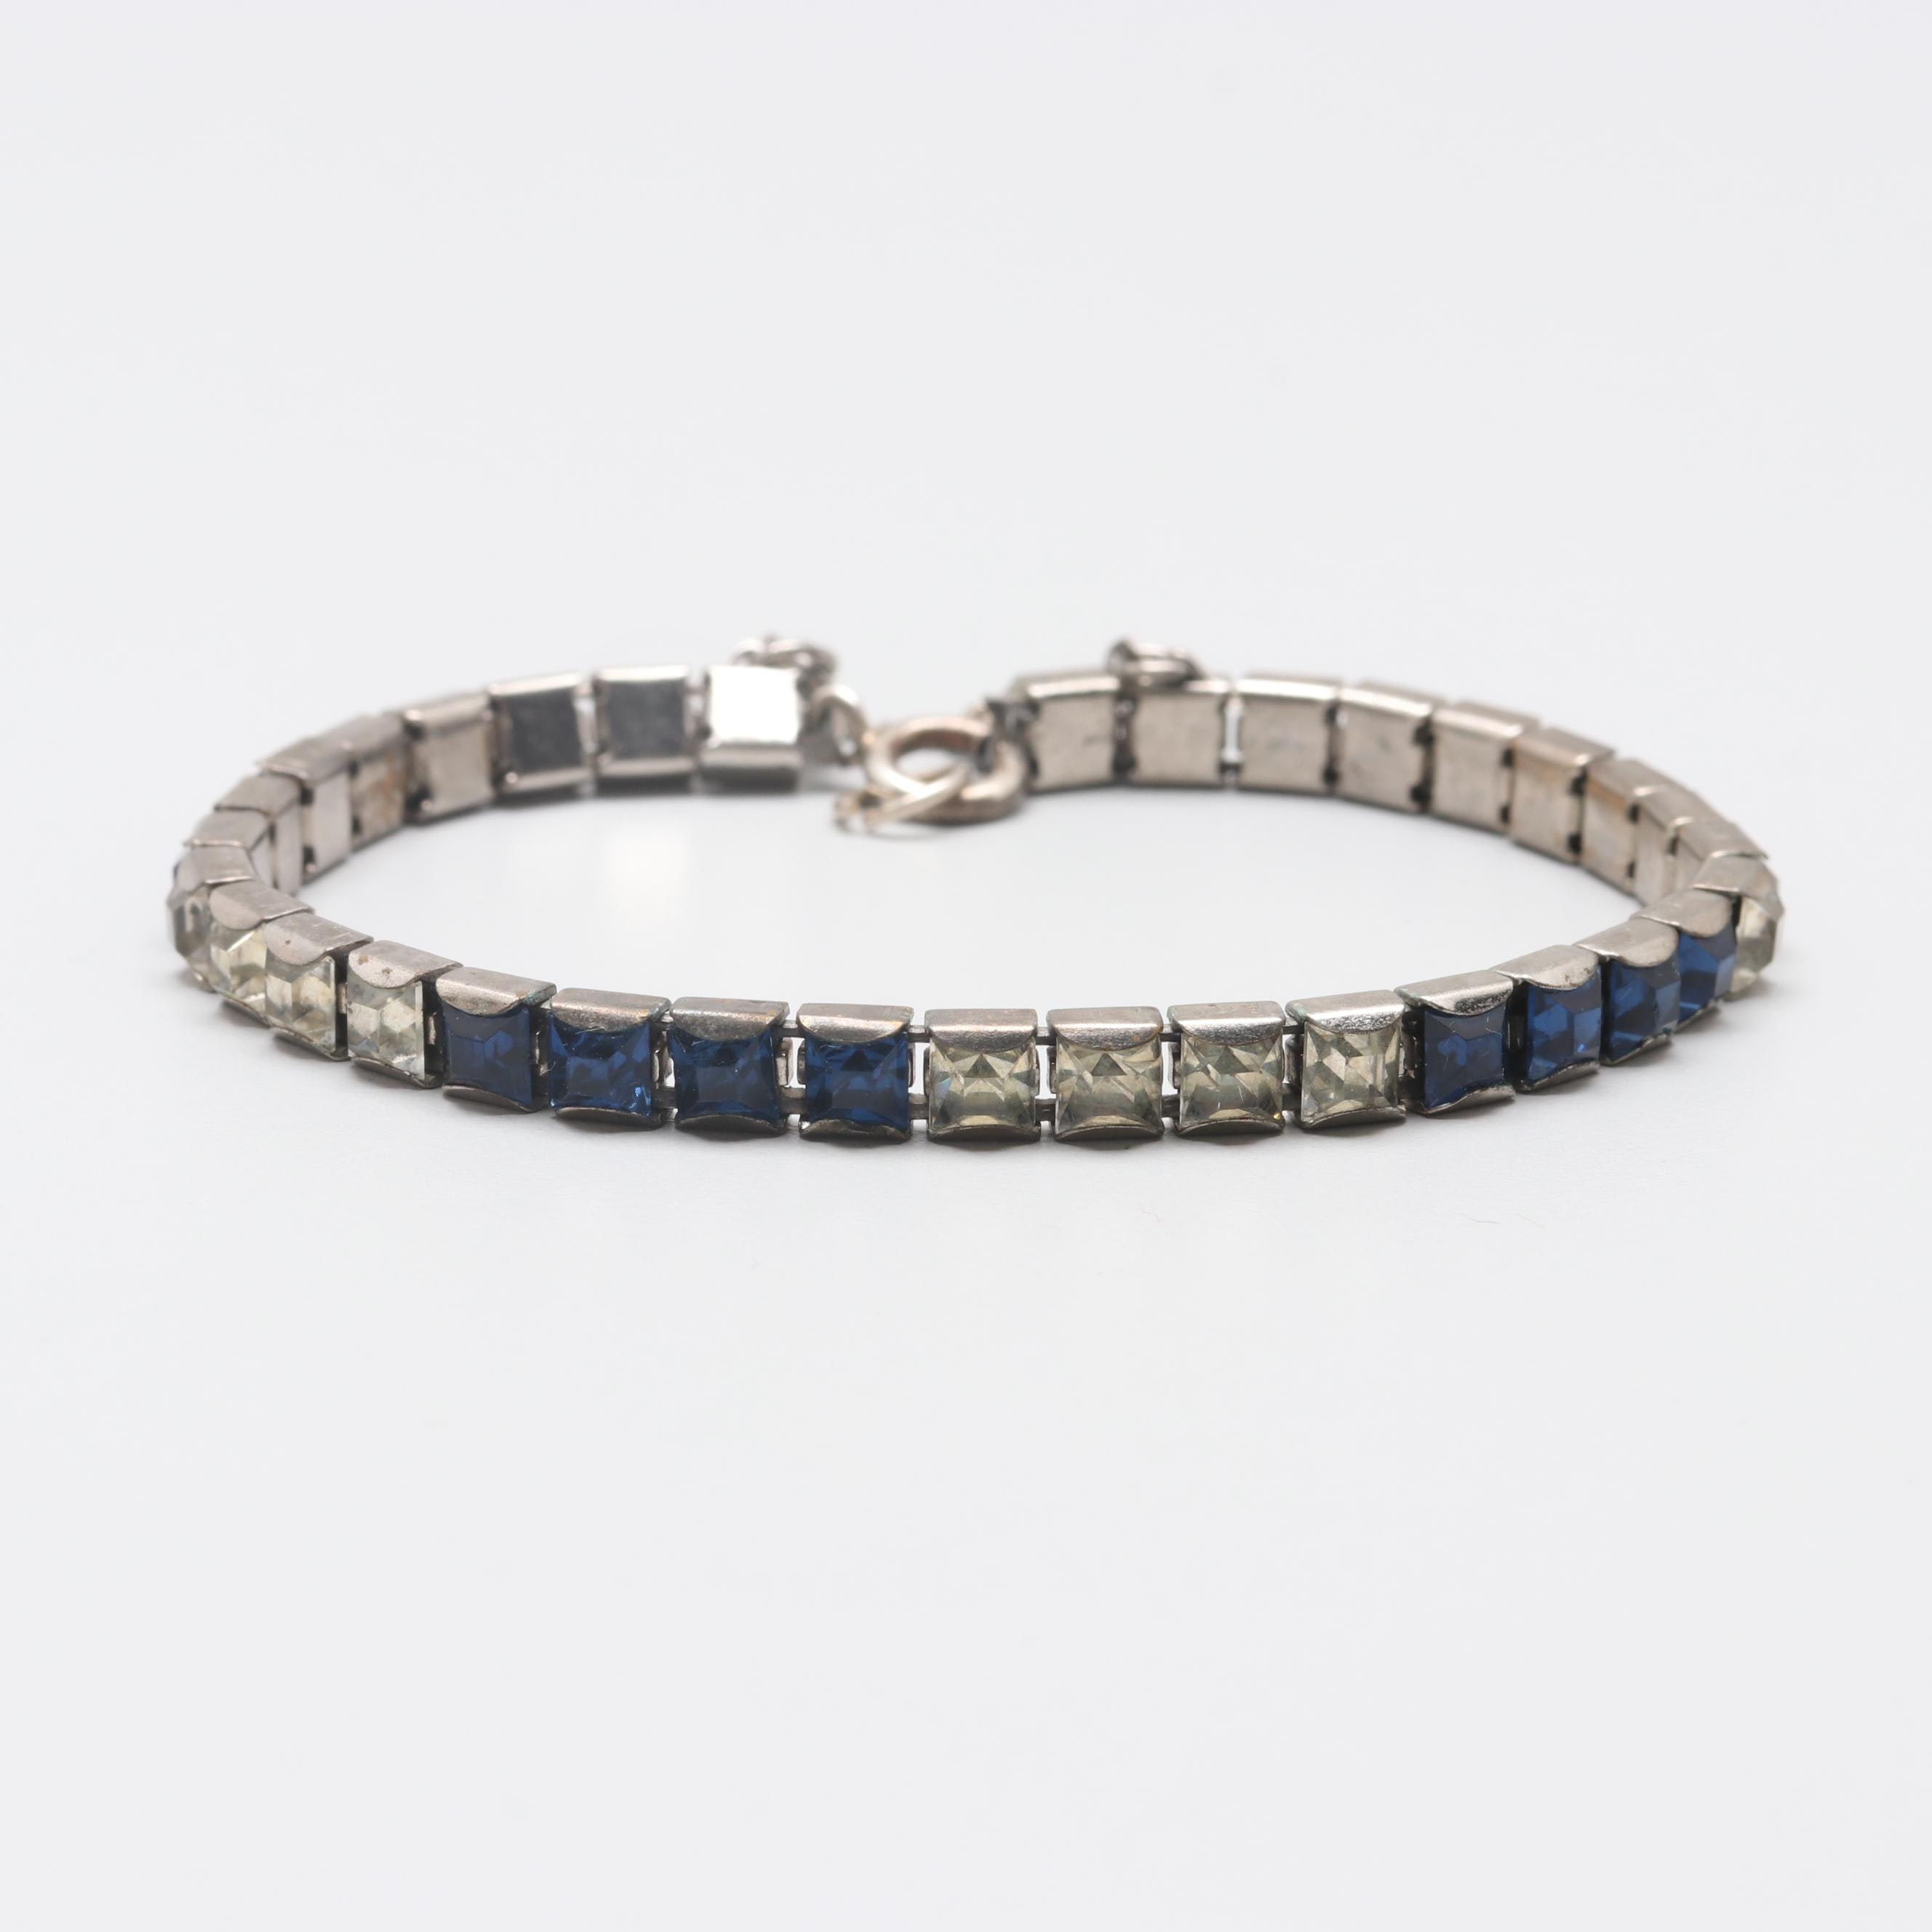 Art Deco Silver Tone Glass Link Bracelet